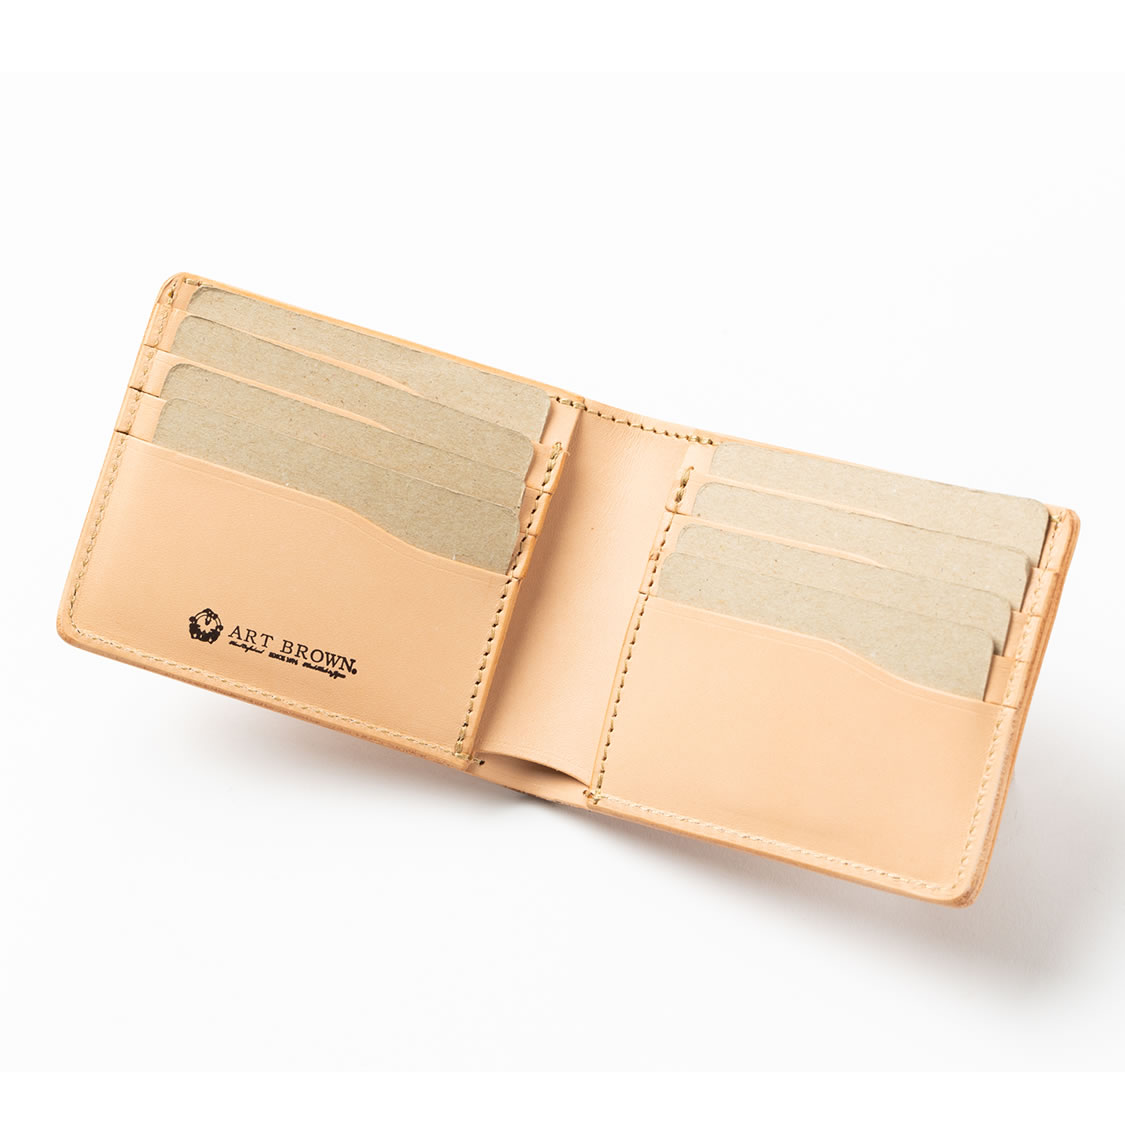 641aa1da37a4 送料無料 送料無料 レザー小物 名入れ可】二つ折り財布(オールカード)/折 ...